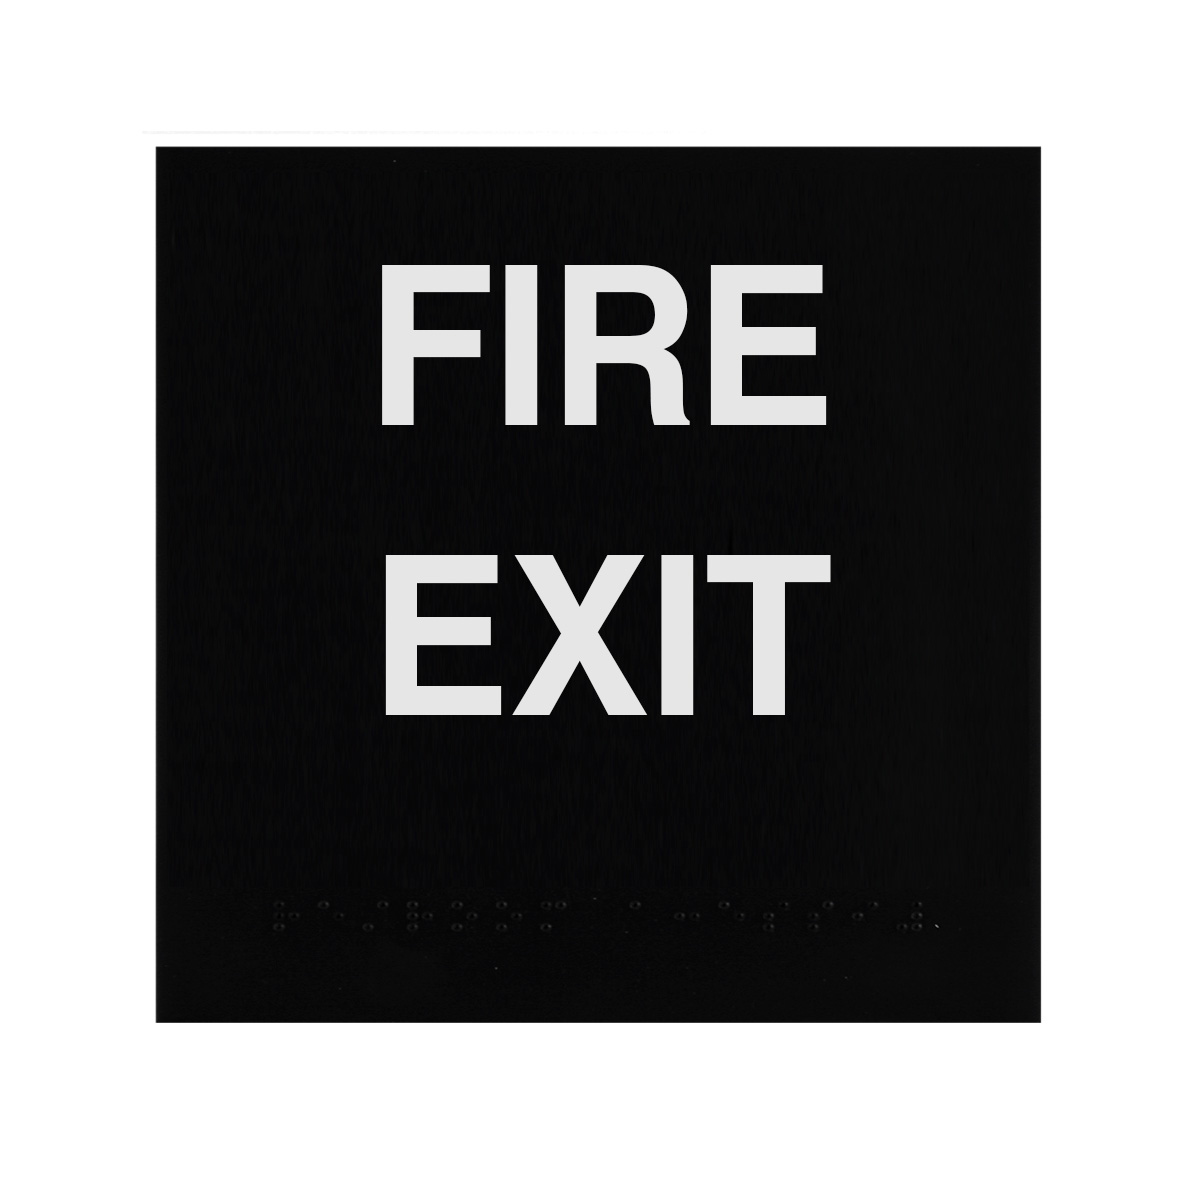 ADA Braille Fire Exit Sign Engraved Applique Grade 2